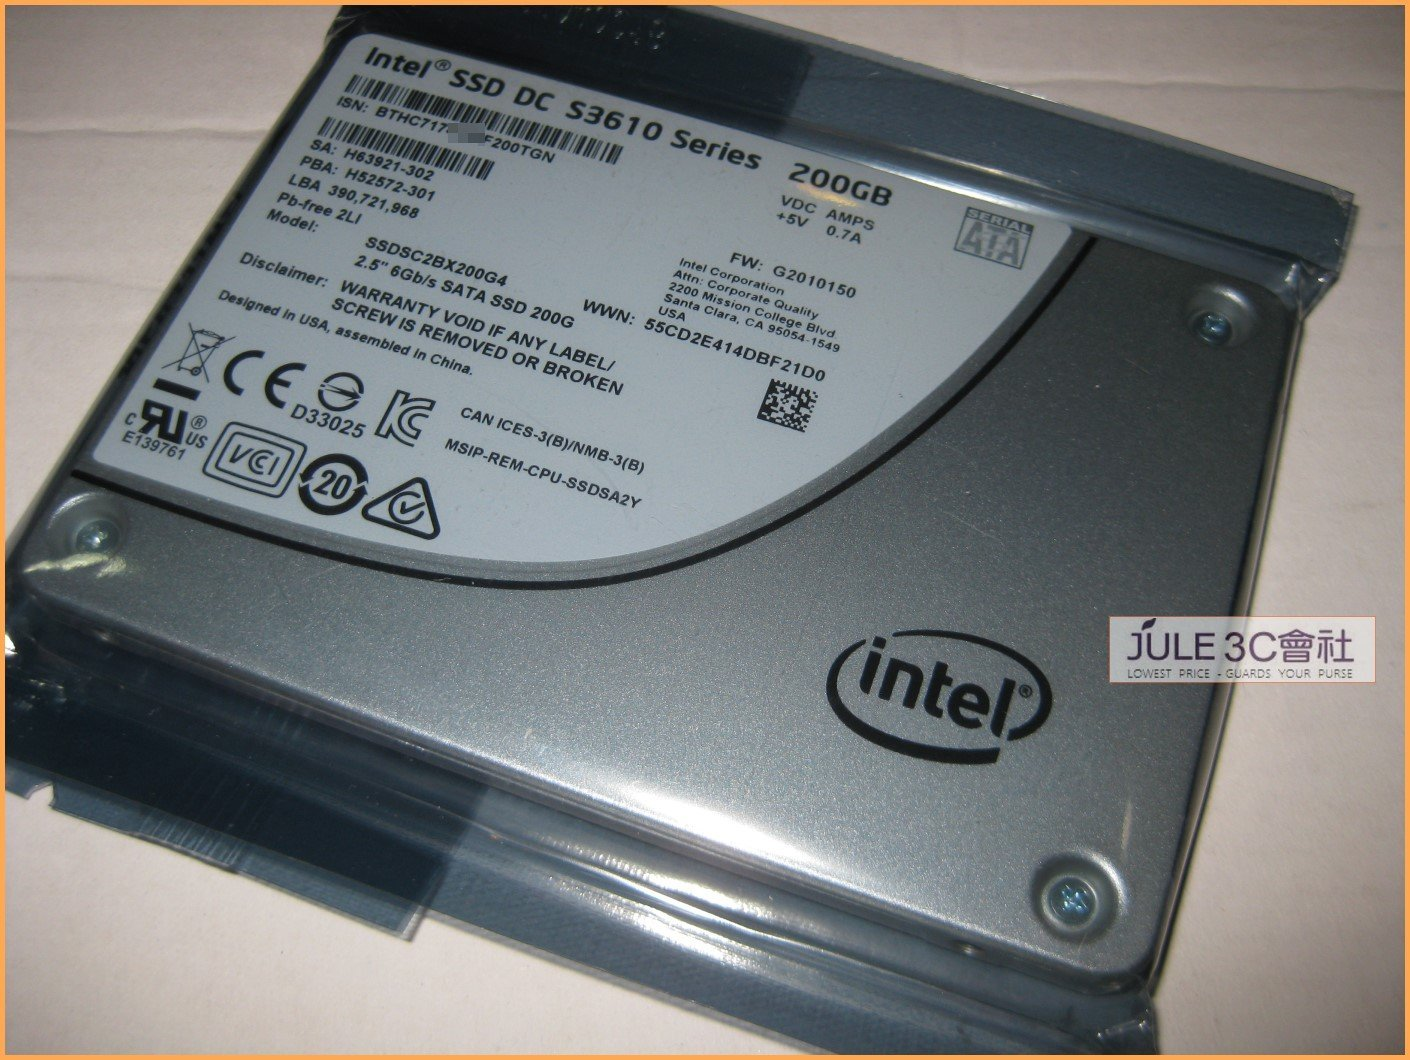 JULE 3C會社-INTEL SSD DC S3610 200GB 200G 企業級/全新/2.5/SATA 3 硬碟